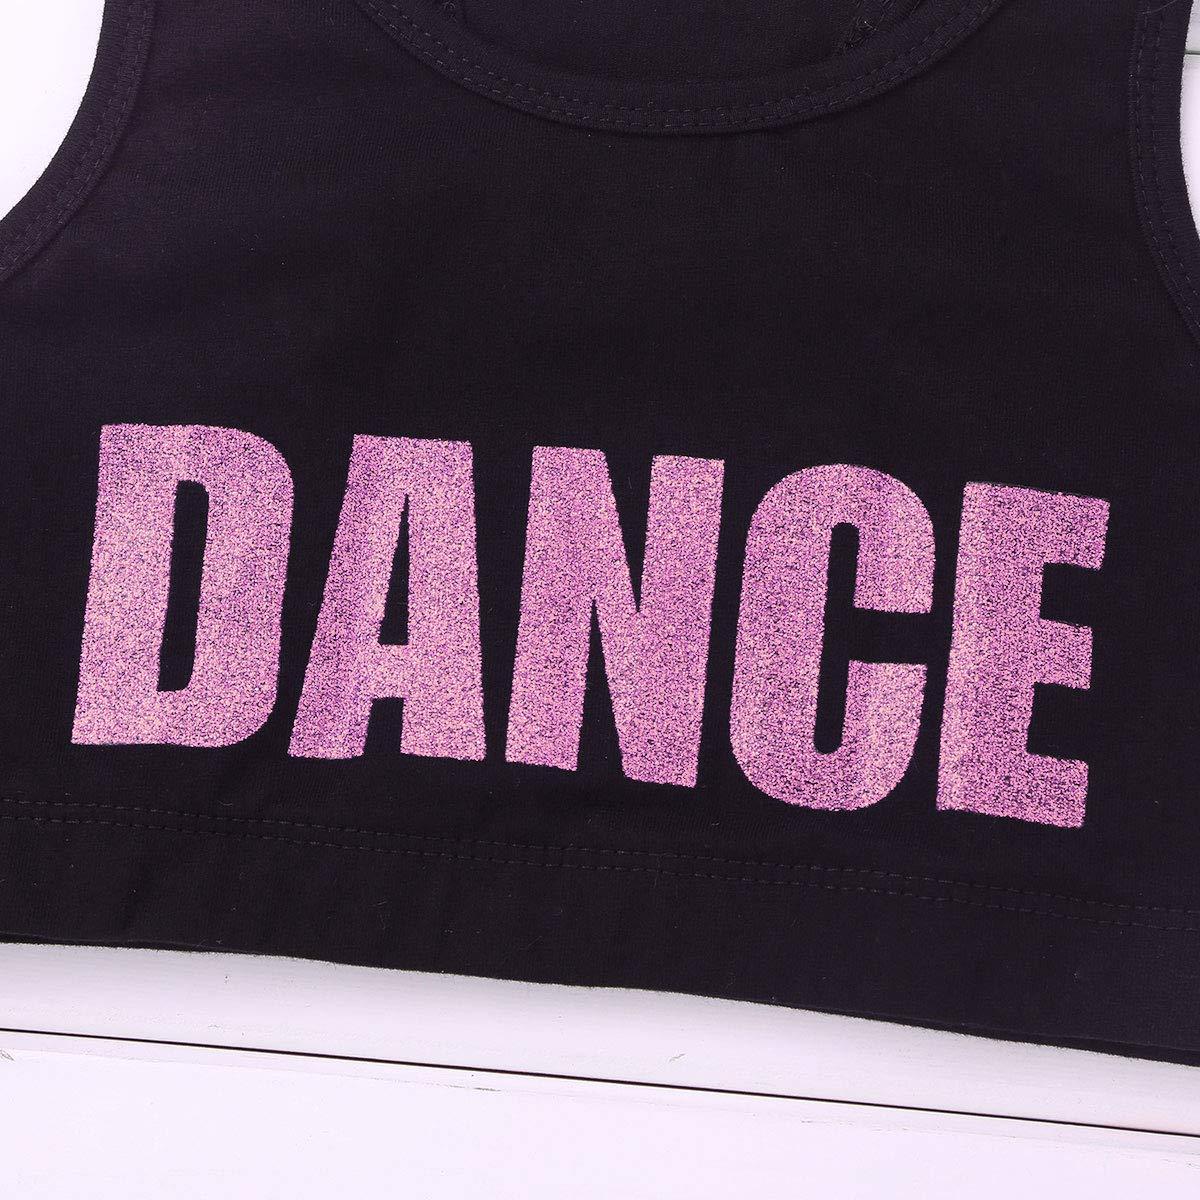 inlzdz Little Big Girls Glittery Dance Racerback Crop Top Sports Bras Gymnastics Ballet Athletic Tees Tank